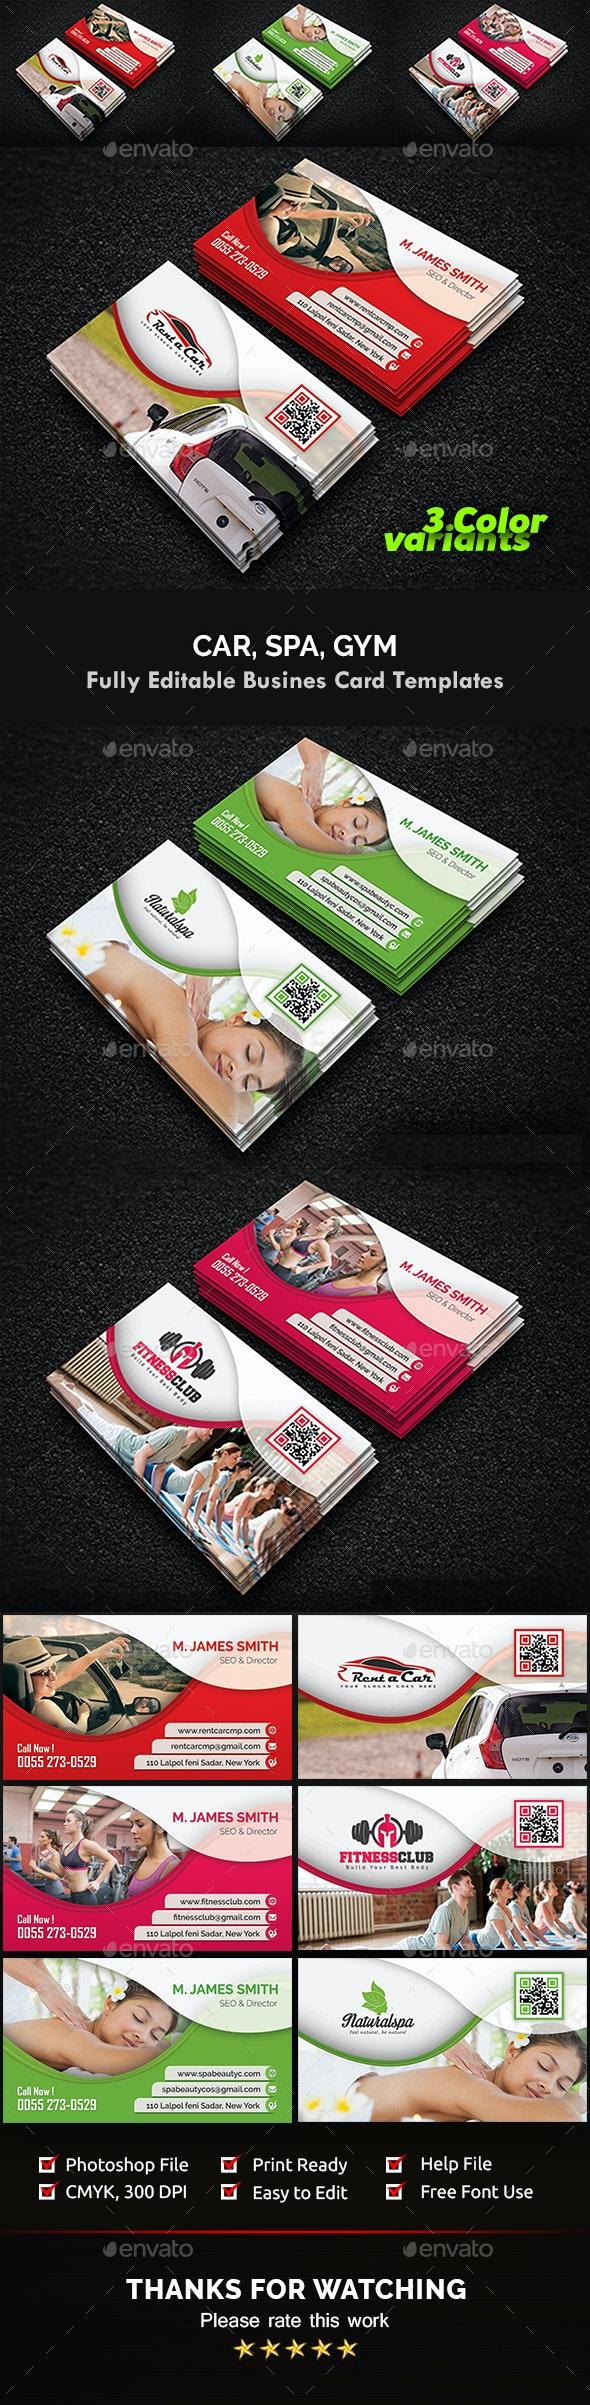 Gym, Spa & Car Business Card Templates - Creative Business Cards